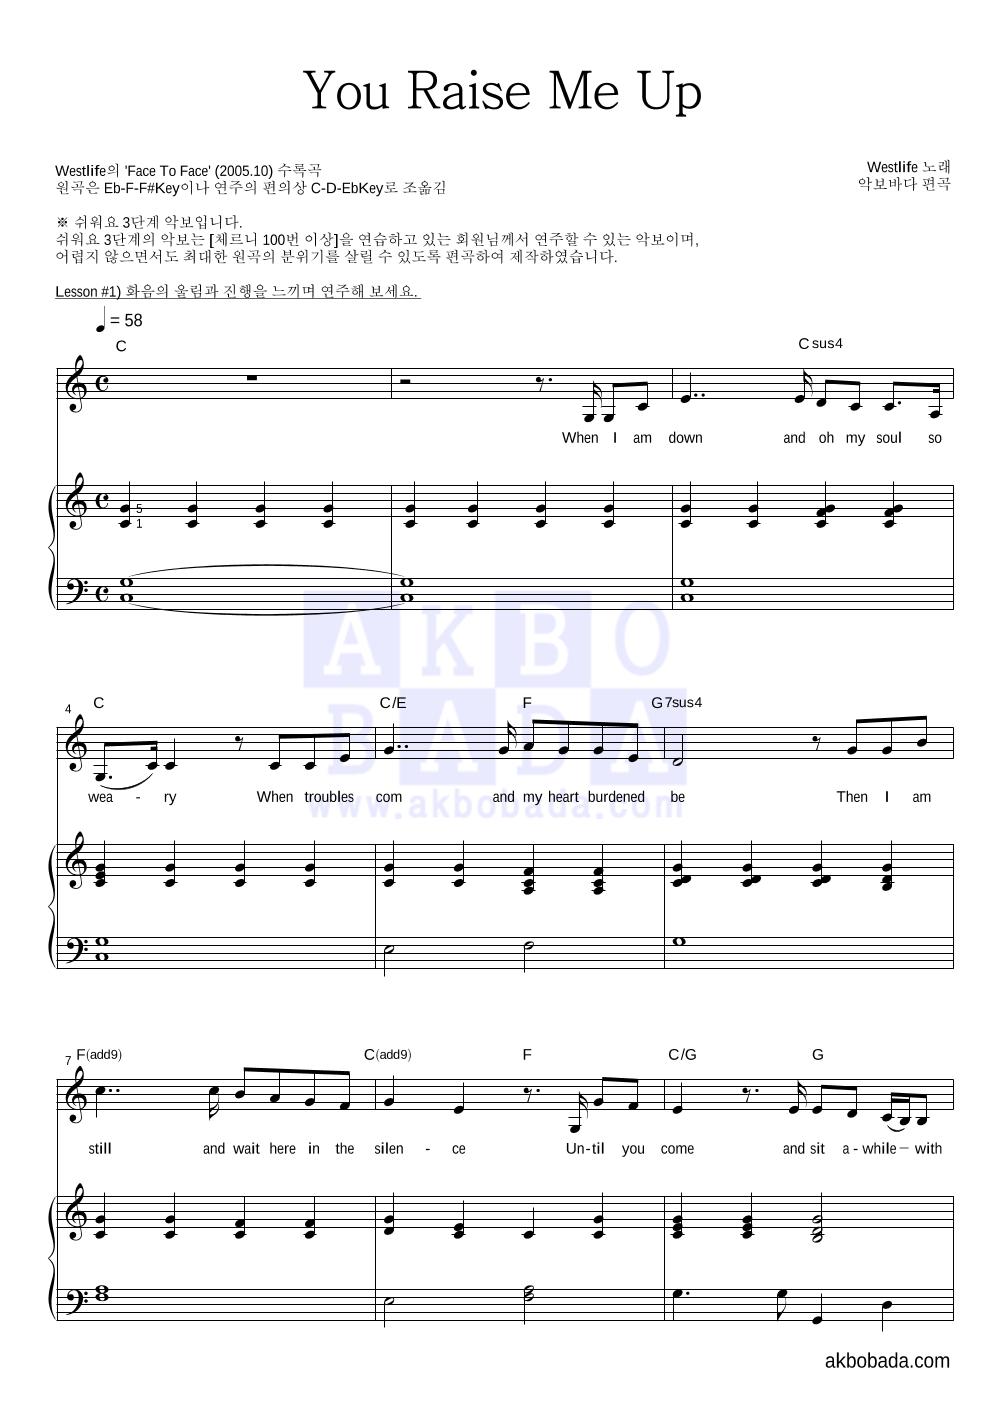 Westlife - You Raise Me Up 피아노3단-쉬워요 악보